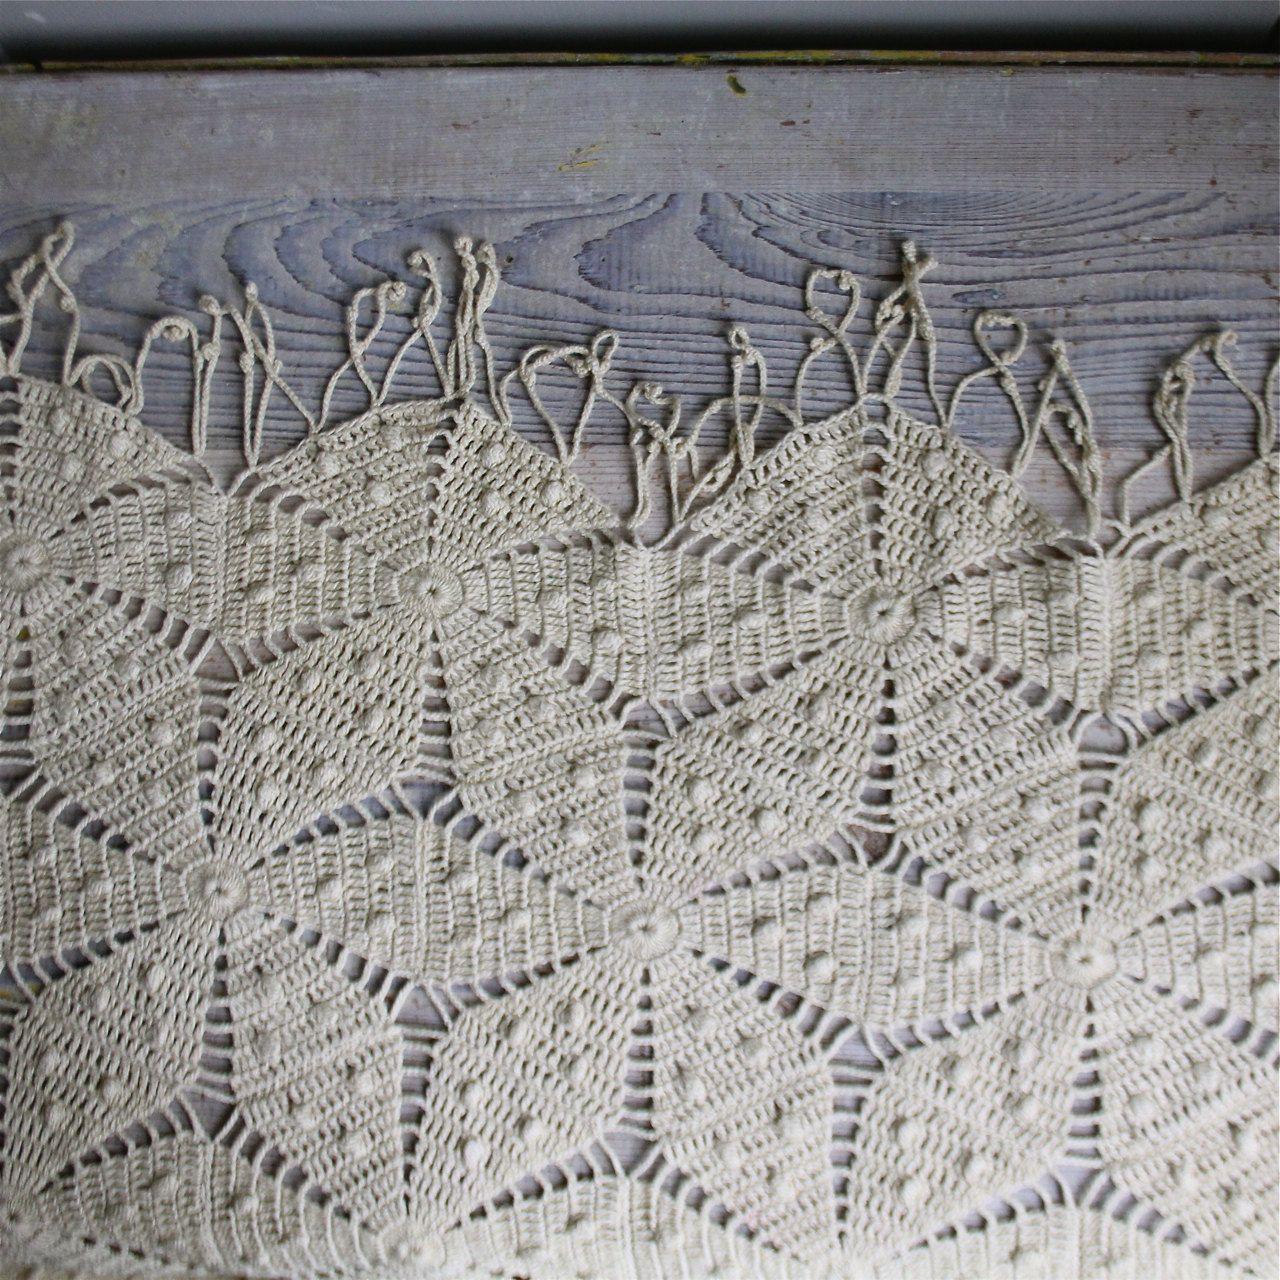 Vintage crochet bedspread coverlet patterns crochet and vintage crochet bedspread bankloansurffo Choice Image